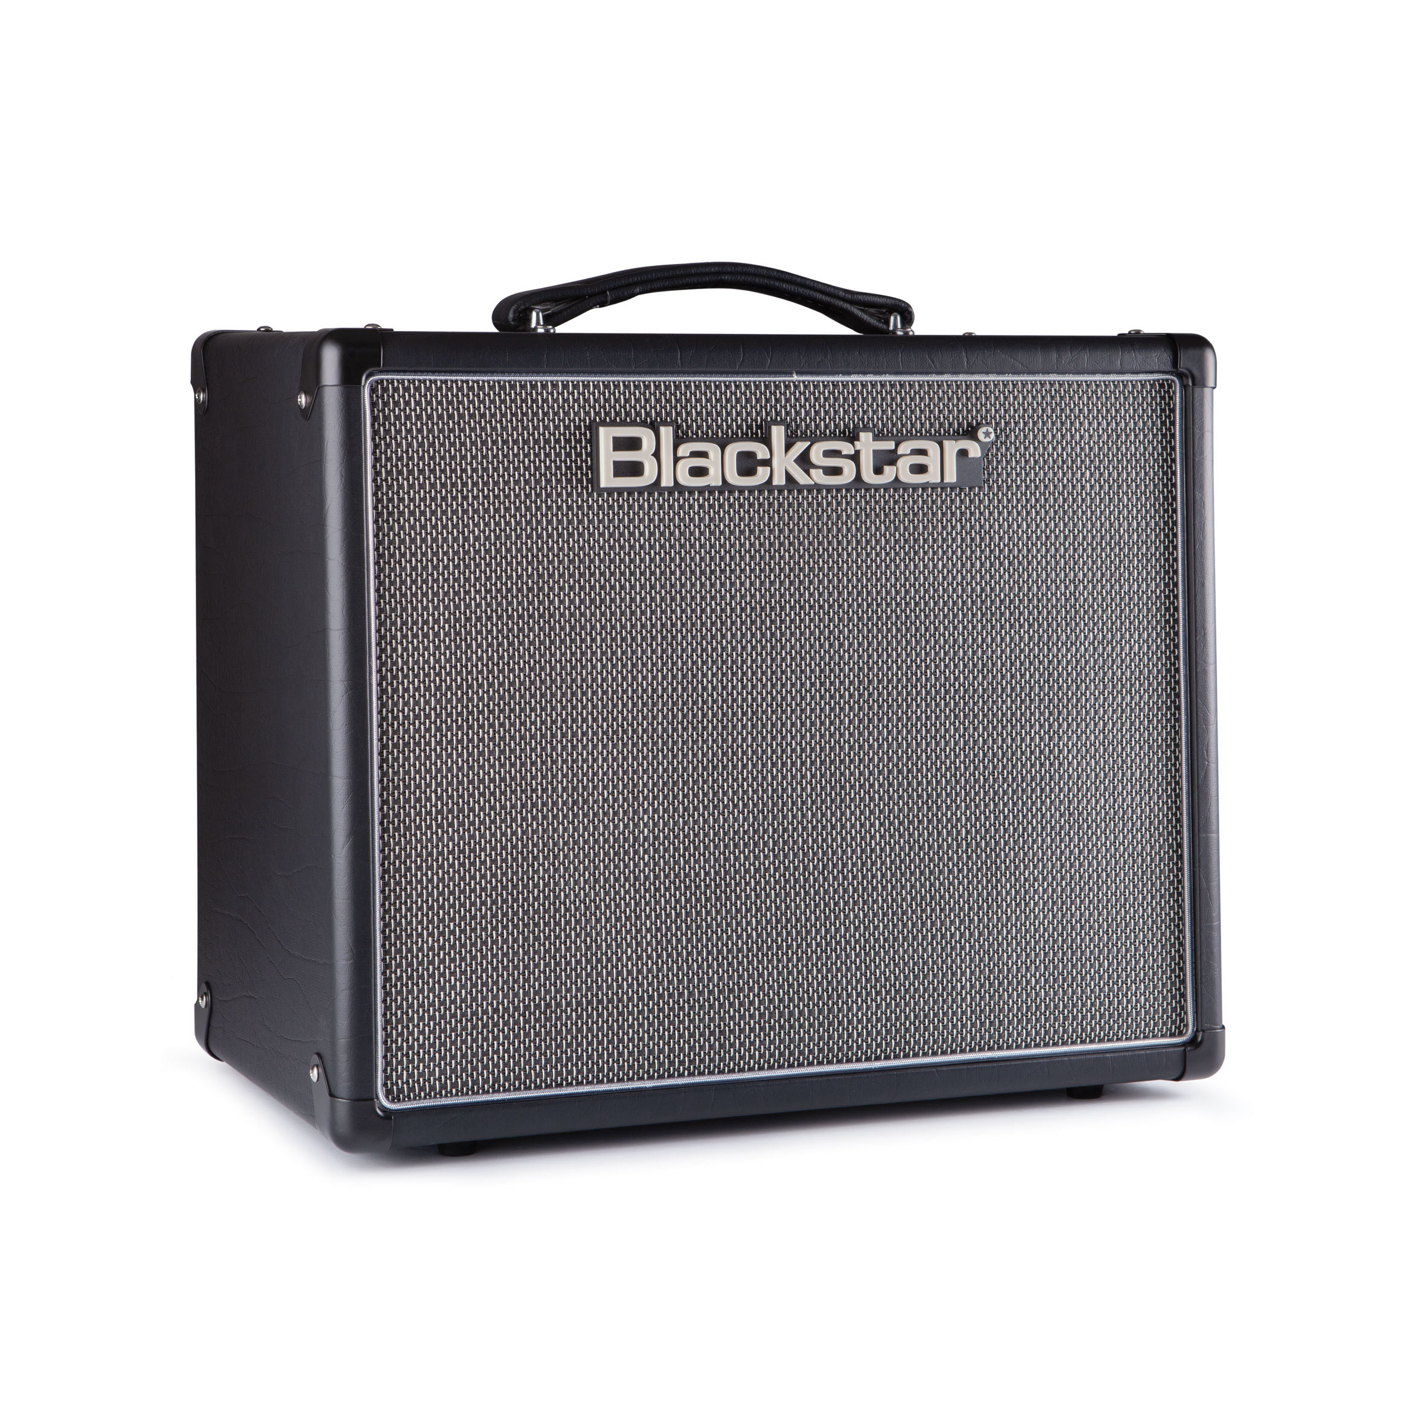 Blackstar HT-5R MKII 5w Valve Amp